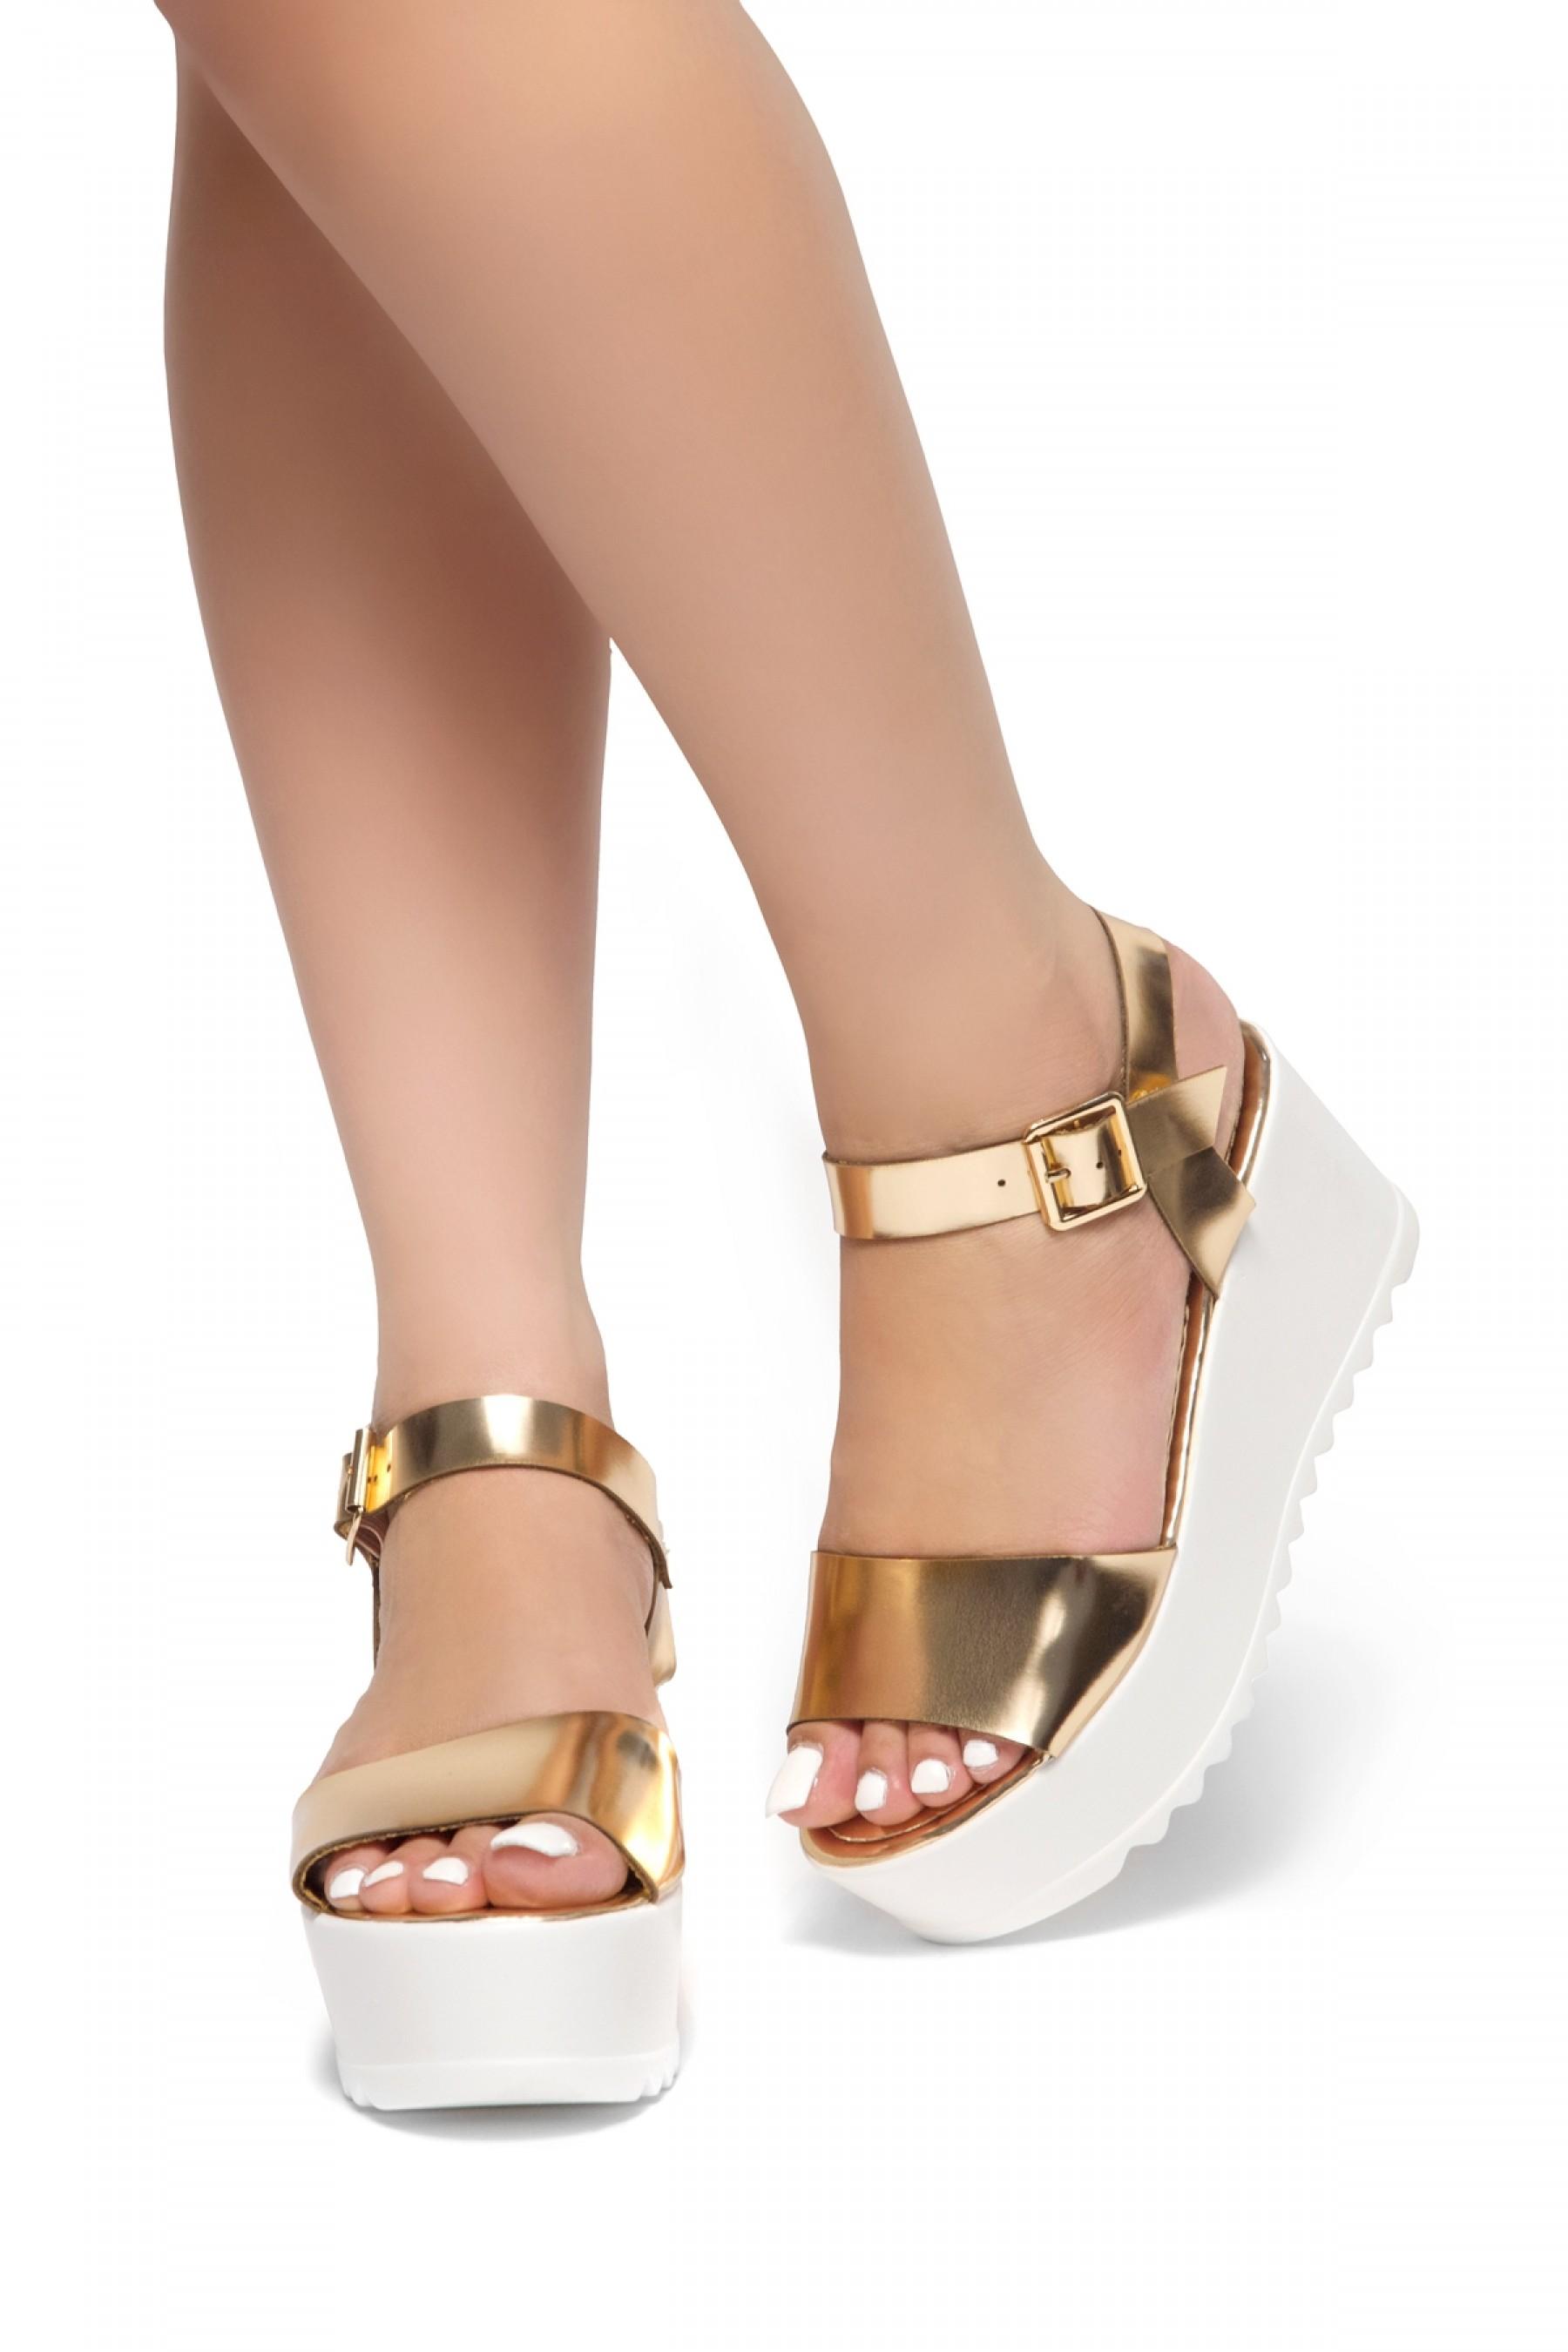 a6f9861db0118 HerStyle Women s Jolliee Open Toe Ankle Strap platform Wedge ...